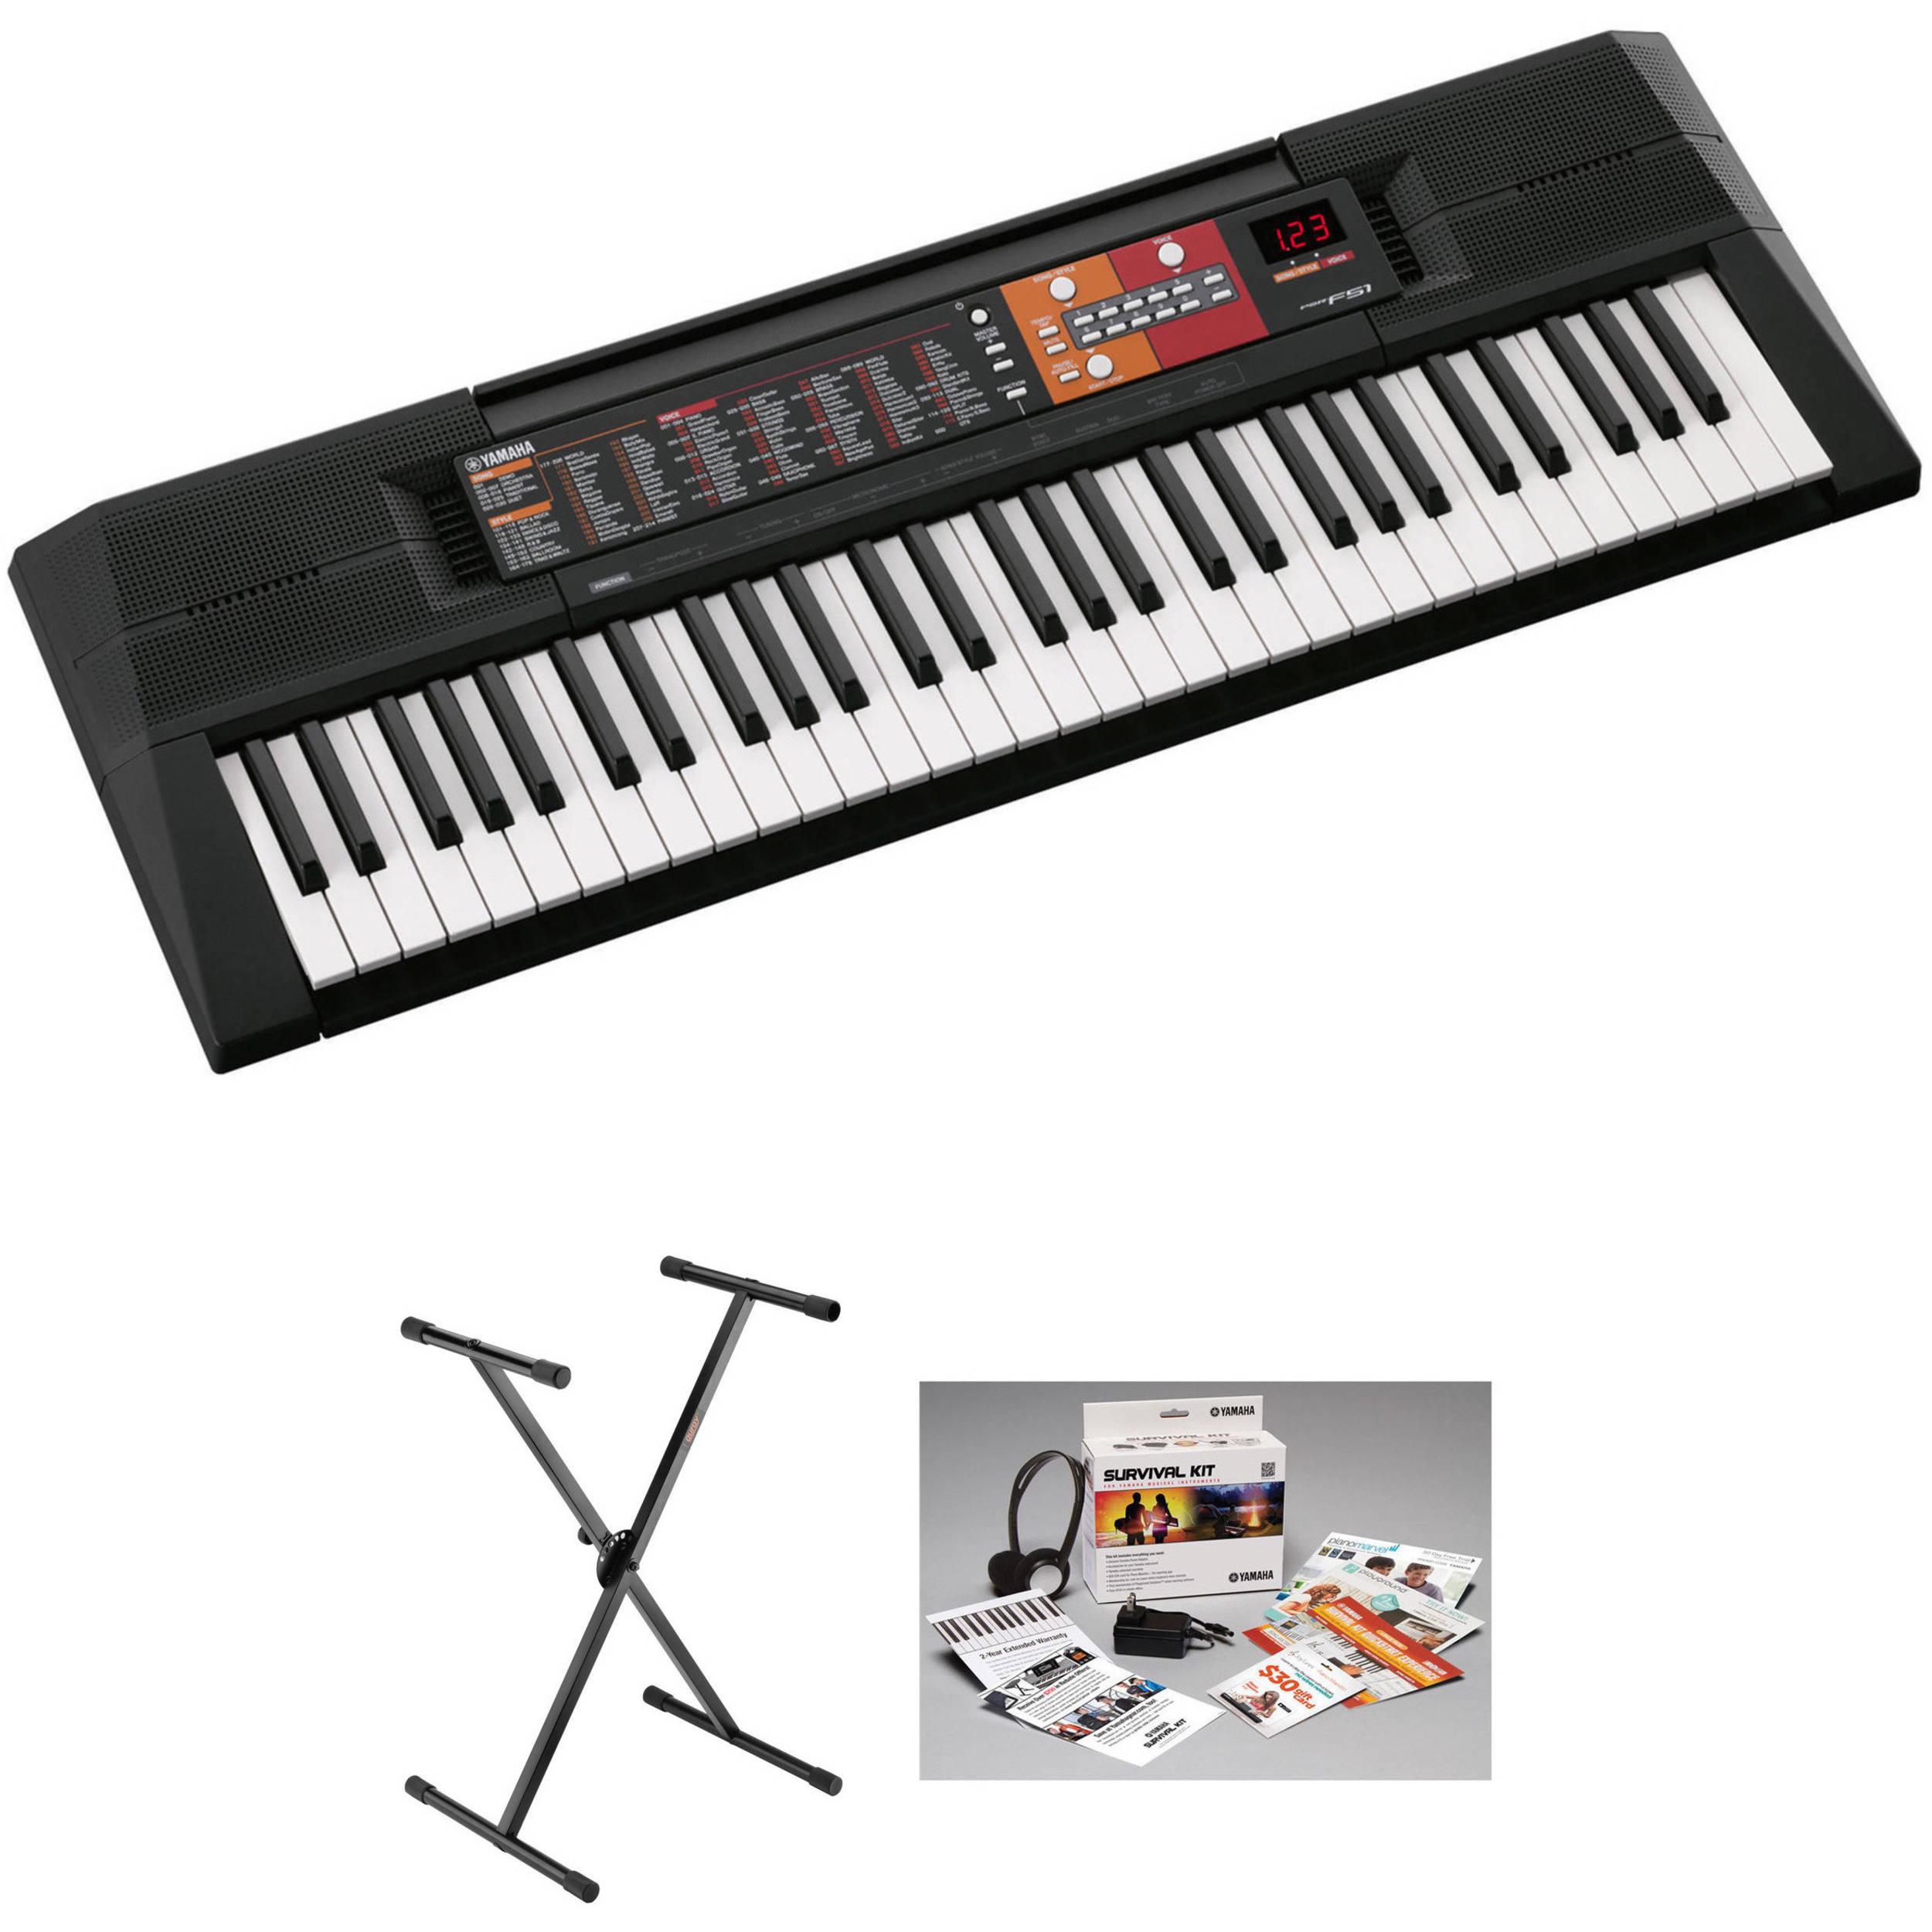 Yamaha psr f51 61 key entry level keyboard kit with stand for Yamaha psr stand